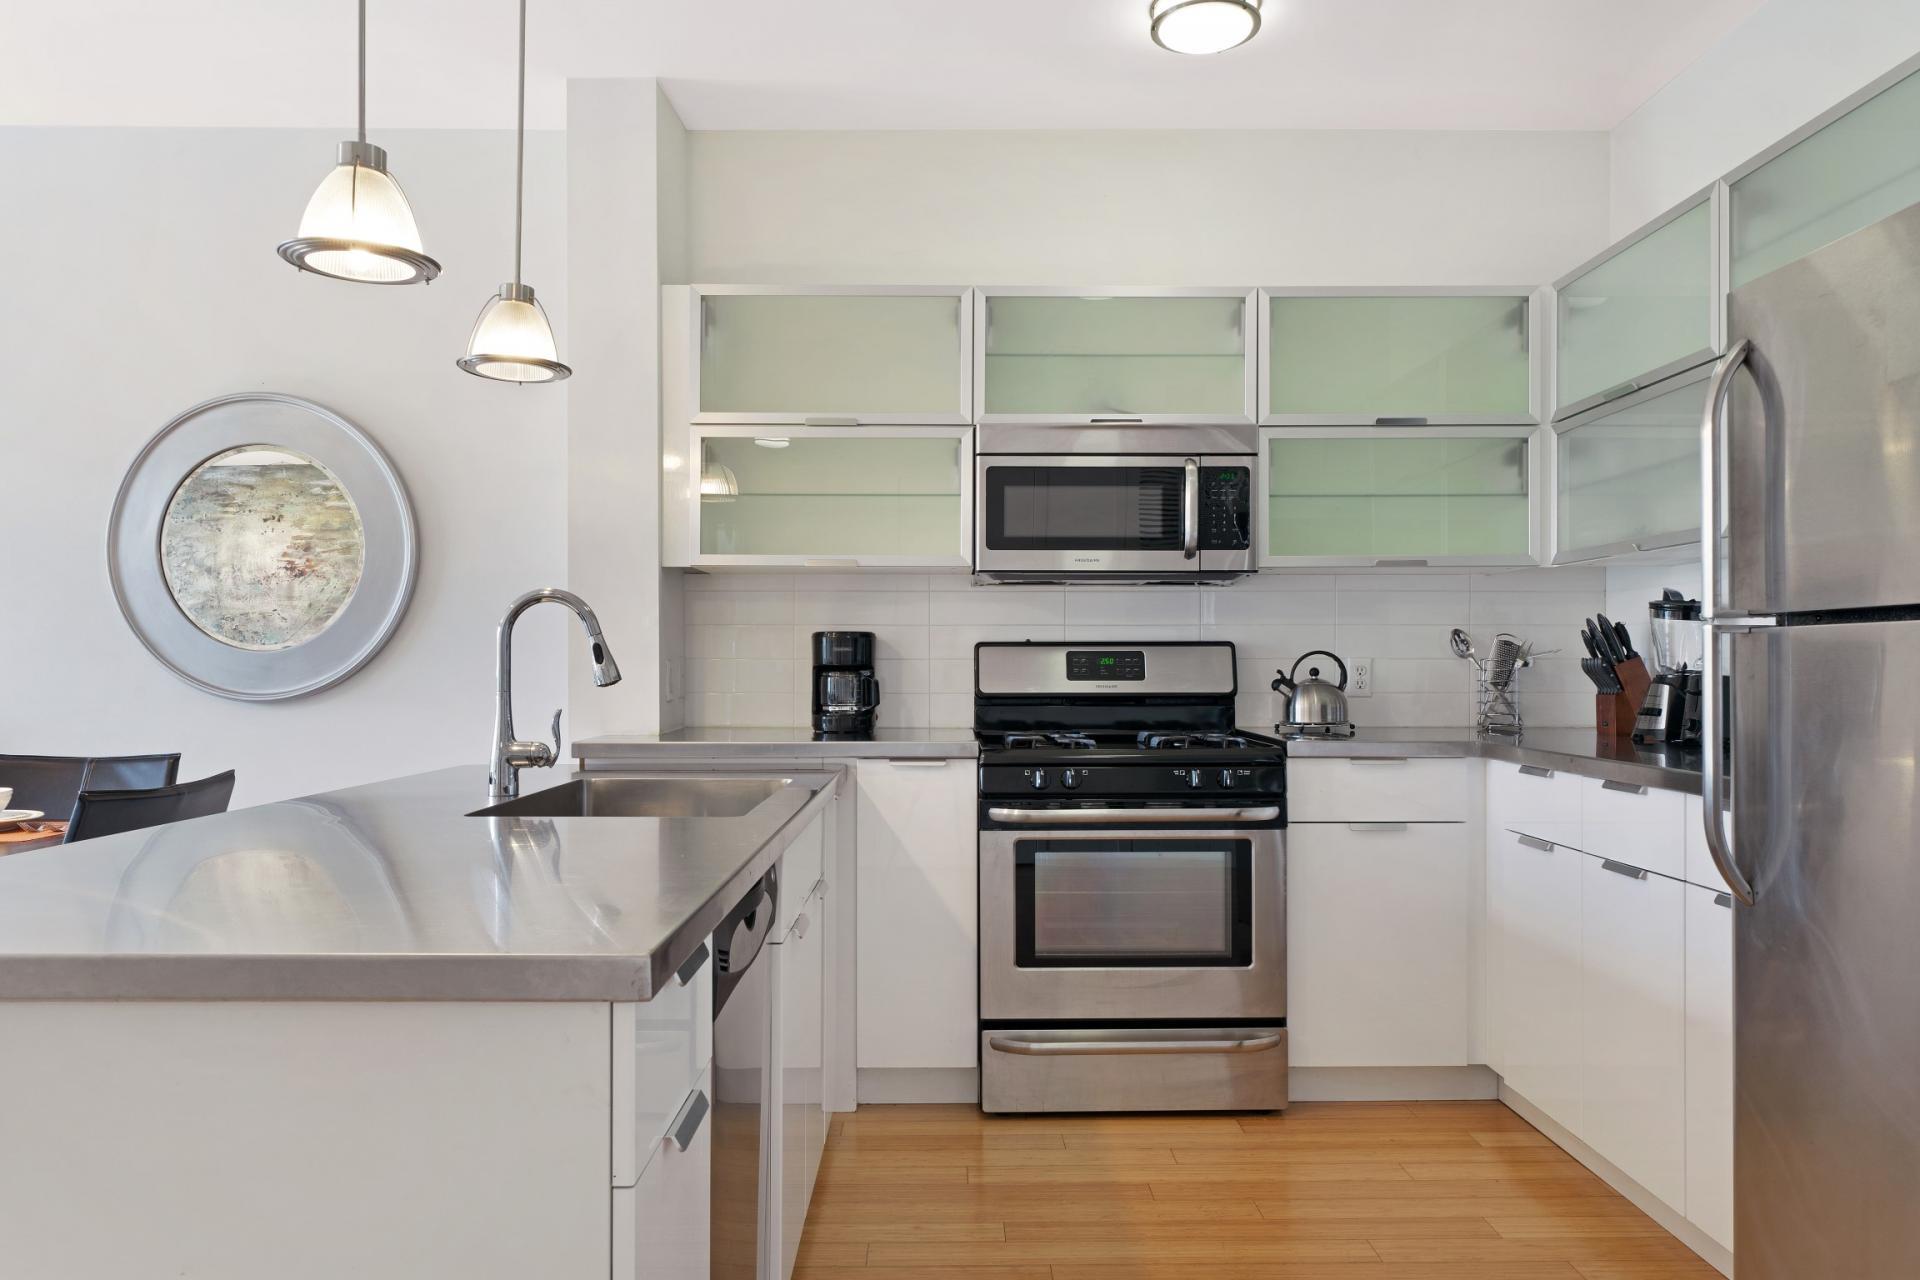 Kitchen at Stamford Blvd Apartments, Centre, Stamford